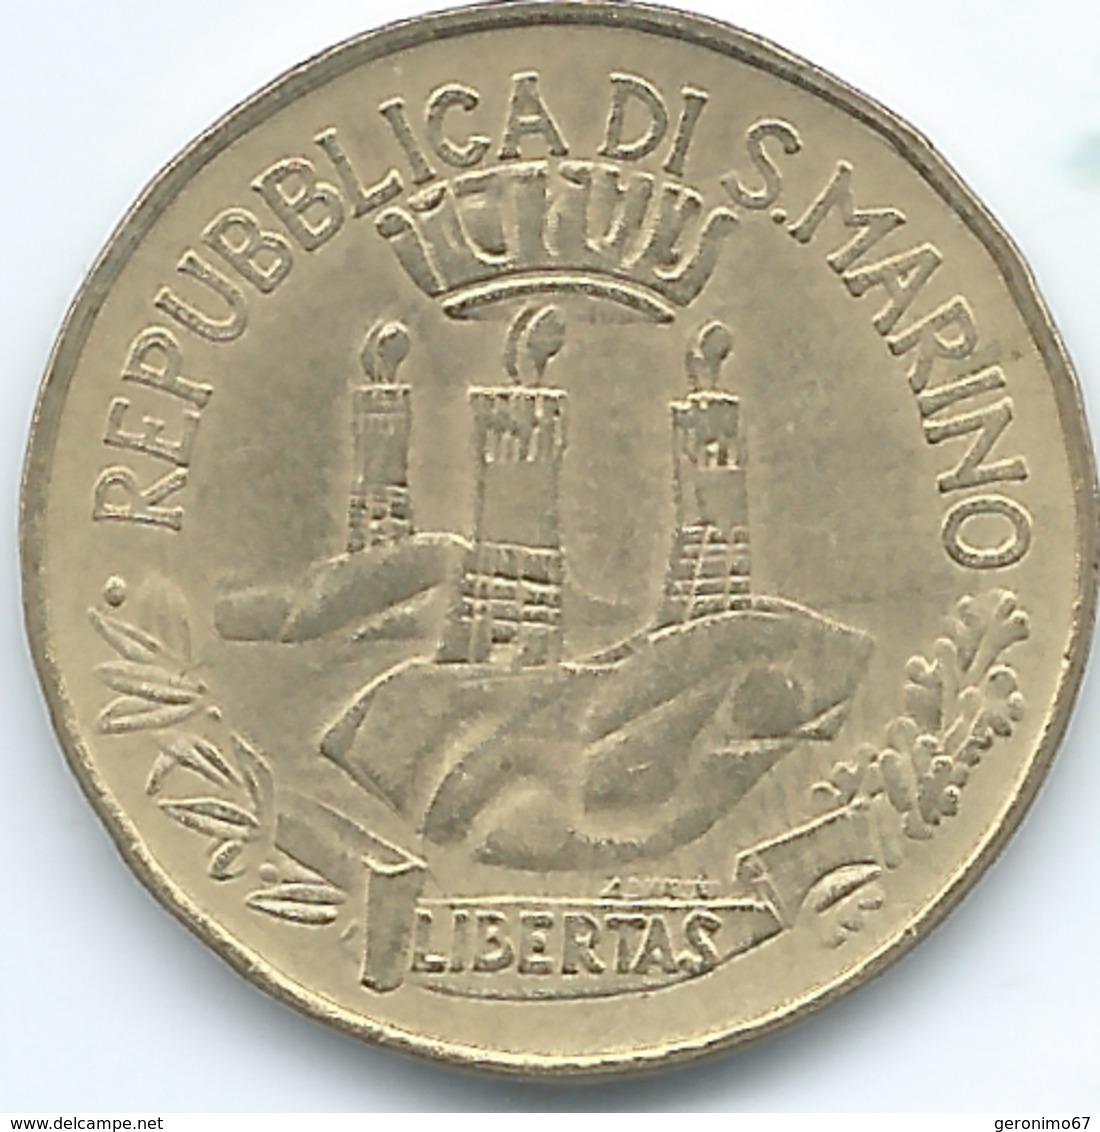 San Marino - 1982 - 20 Lire - KM135 - San Marino